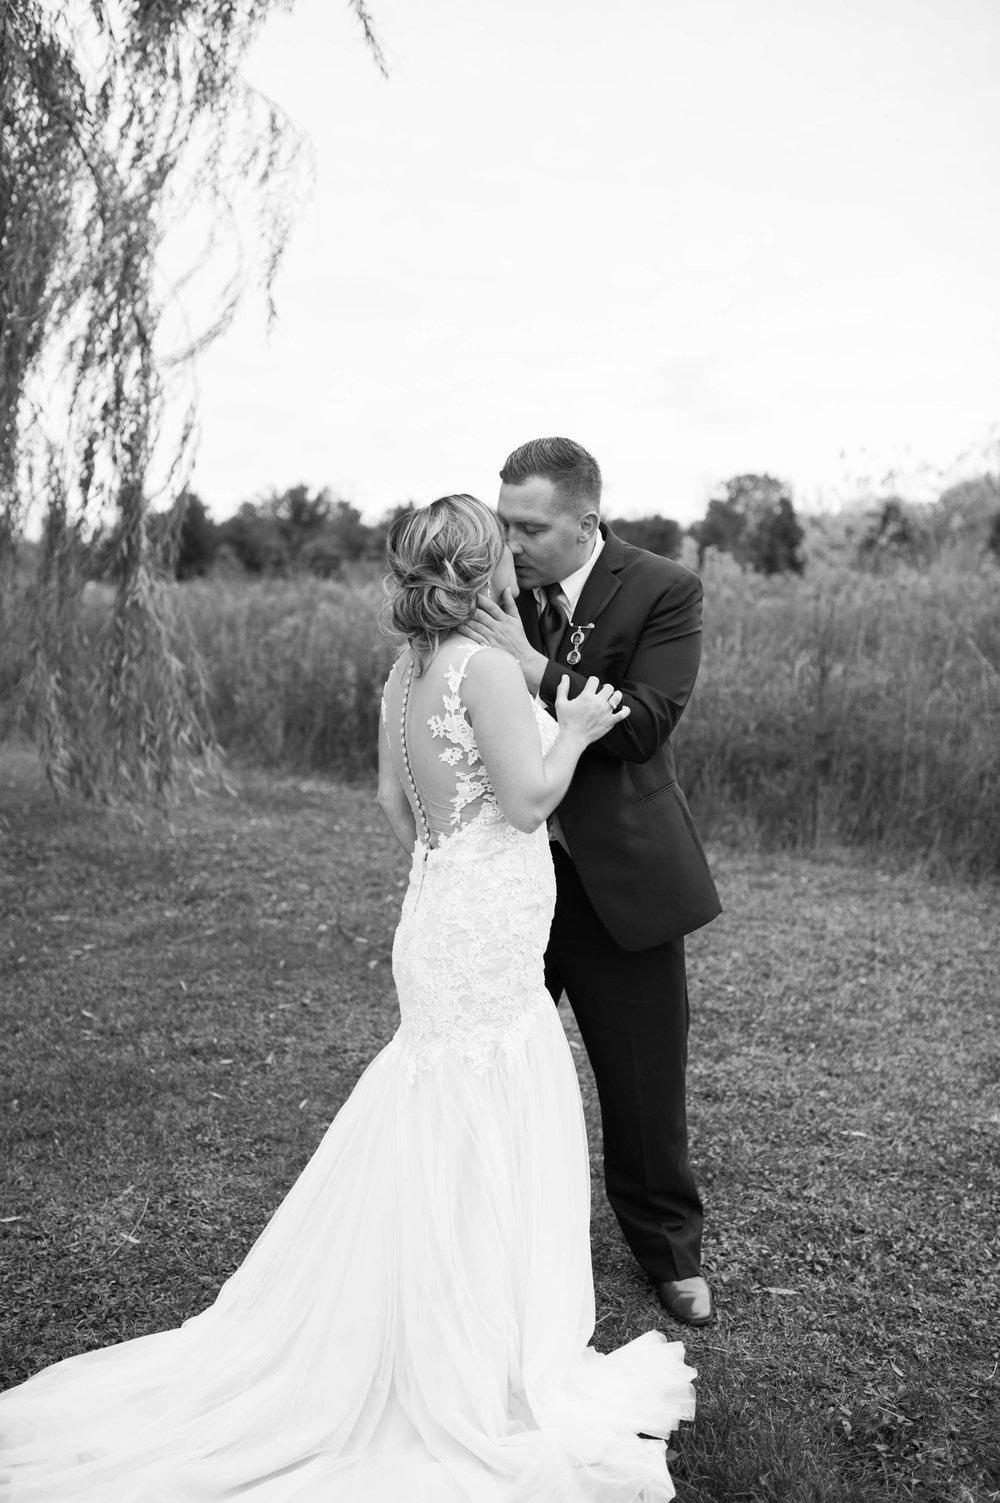 LLP Michigan Wedding Photographer 22.jpg